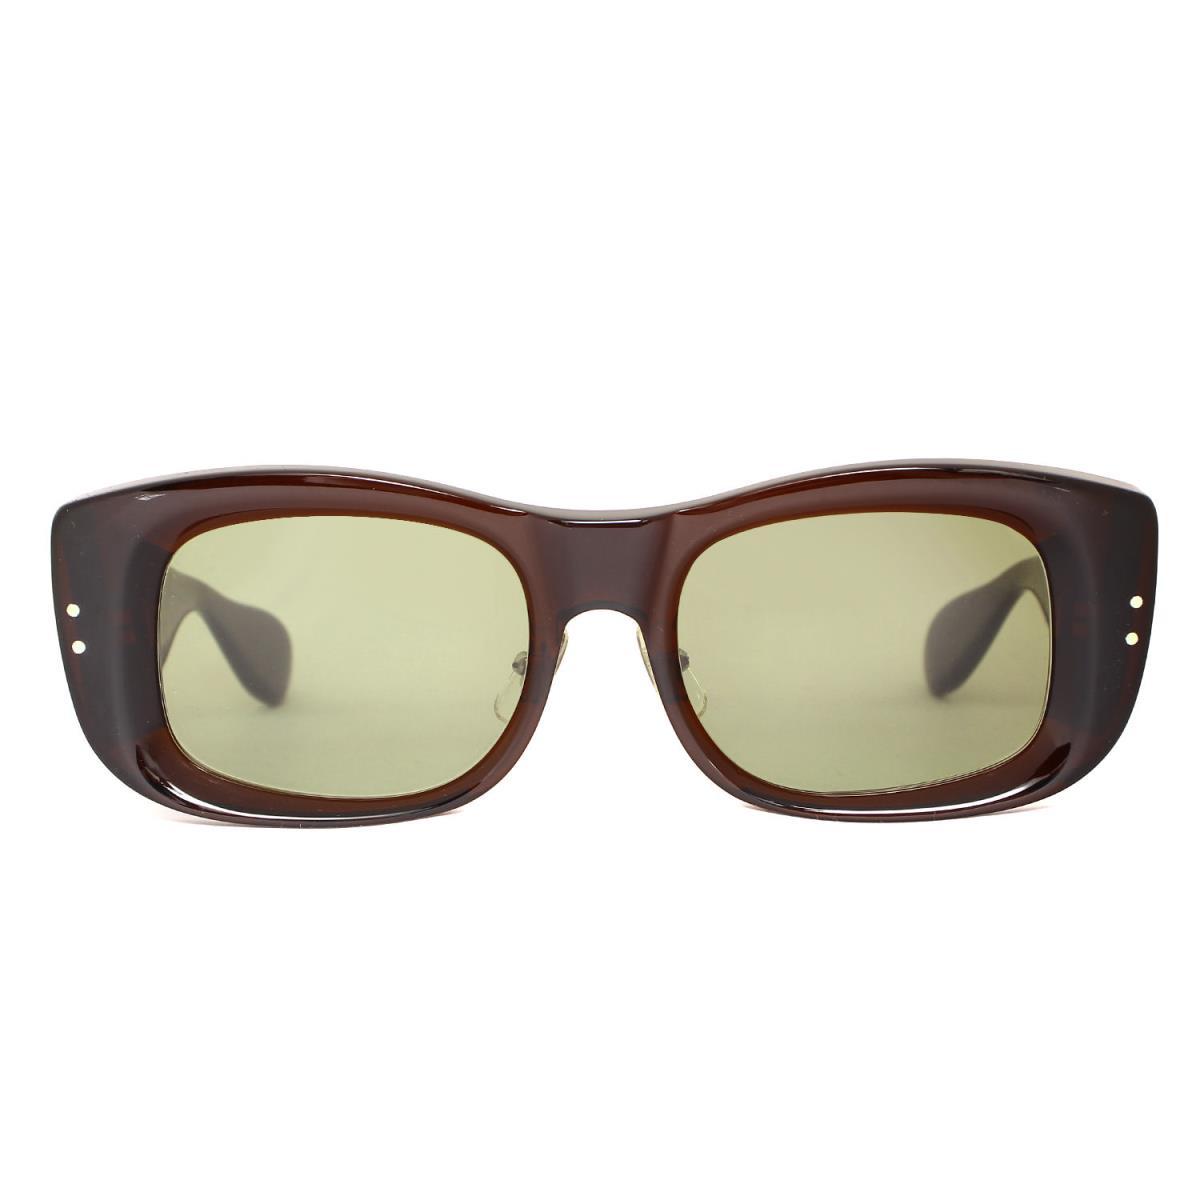 TENDERLOIN テンダーロイン サングラス 白山眼鏡店 ワイドフレーム サングラス T-TV ブラウンフレーム グリーンレンズ 【メンズ】【中古】【K2571】